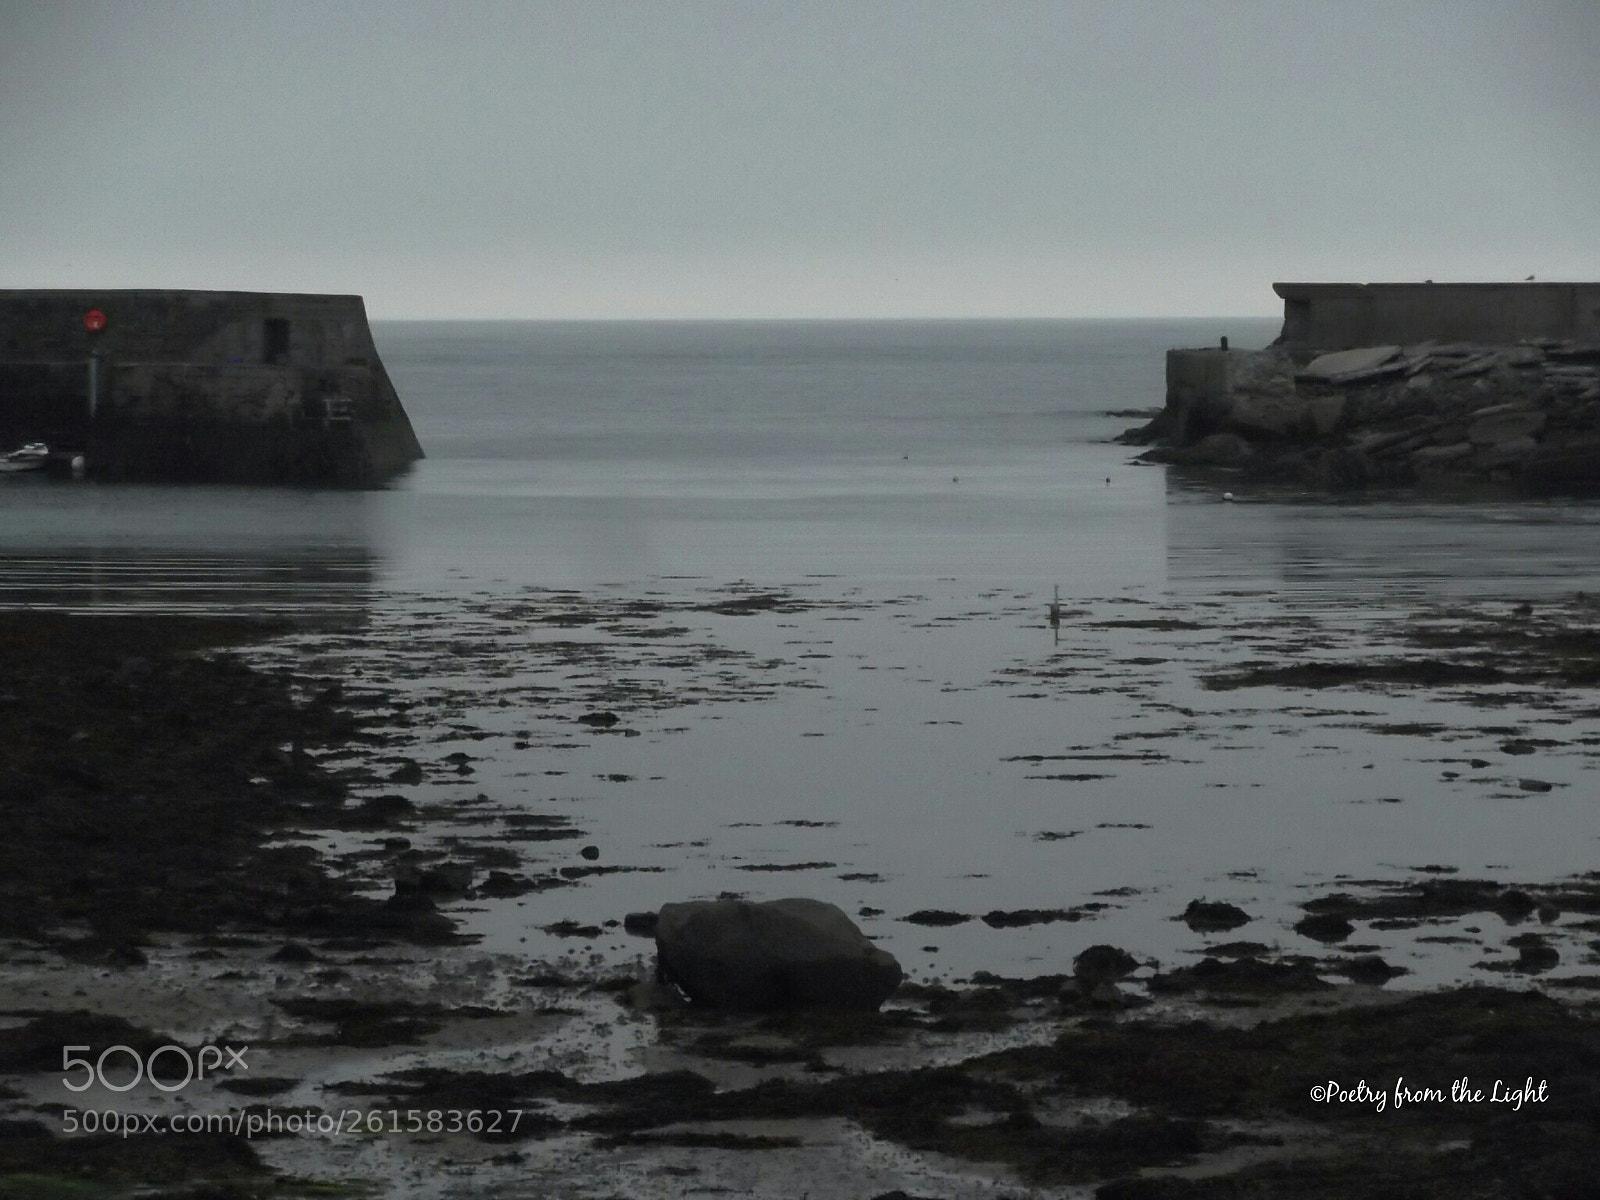 Silent Grey, Fujifilm FinePix T350